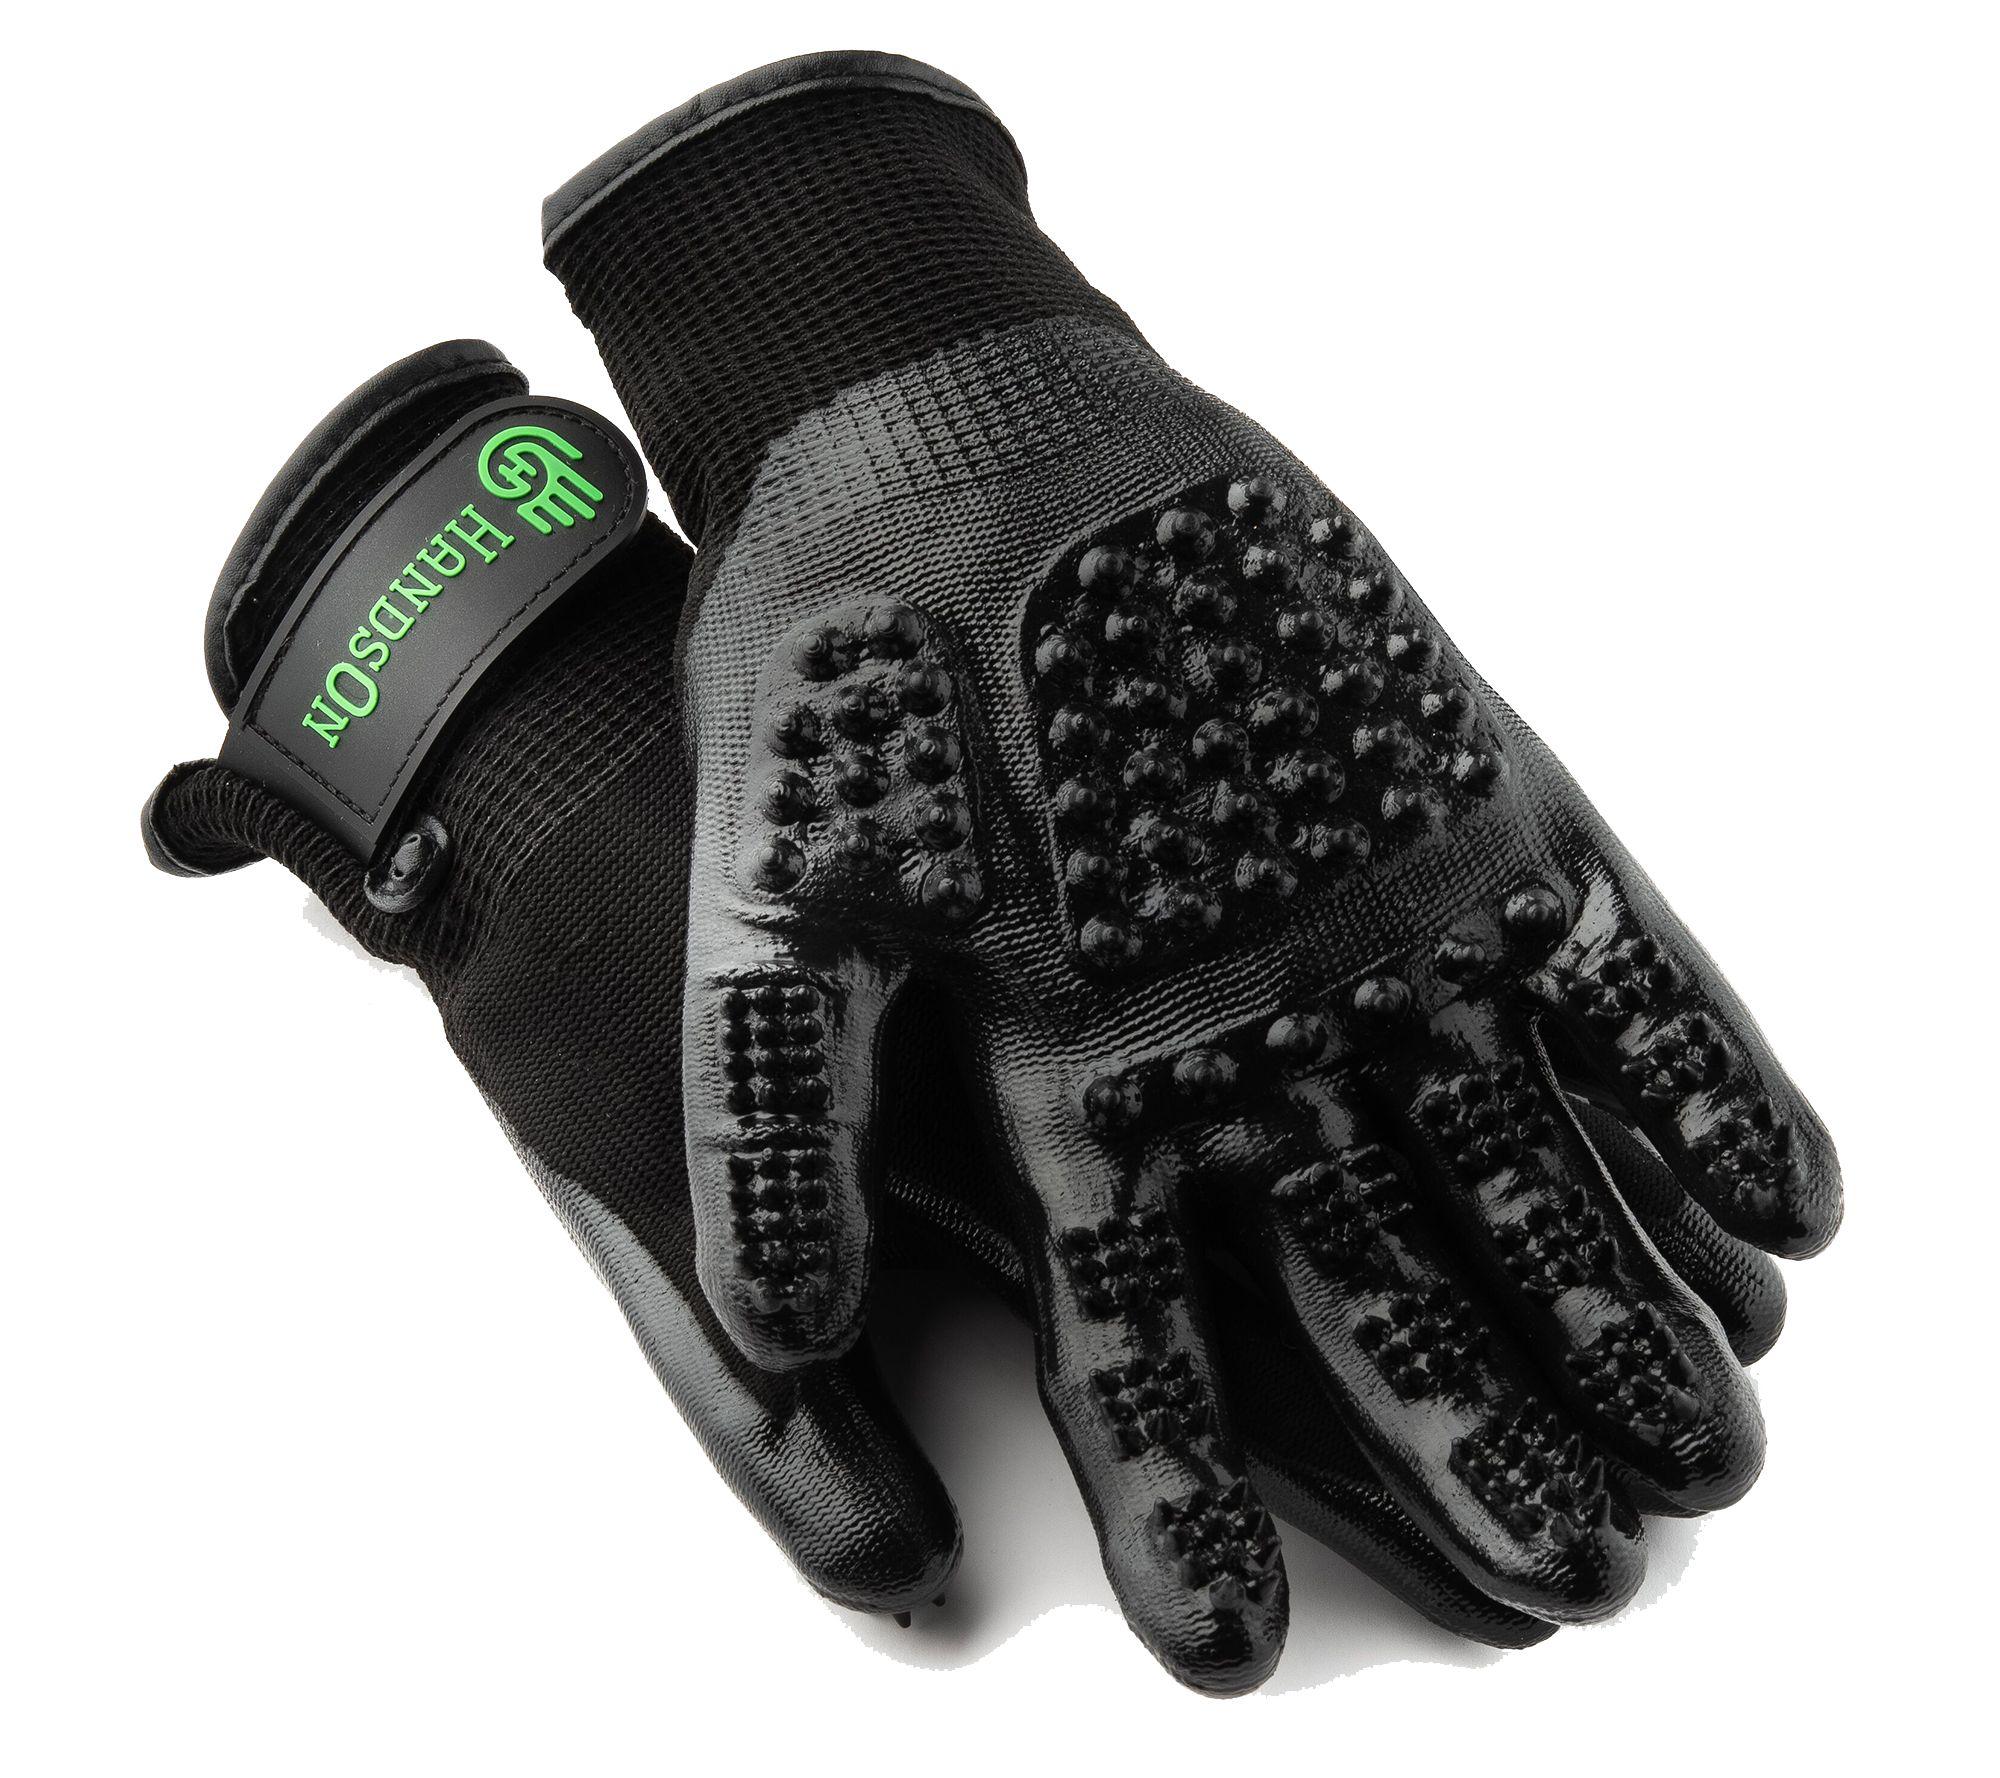 Hands On 1688907 Black Gloves - Extra Large